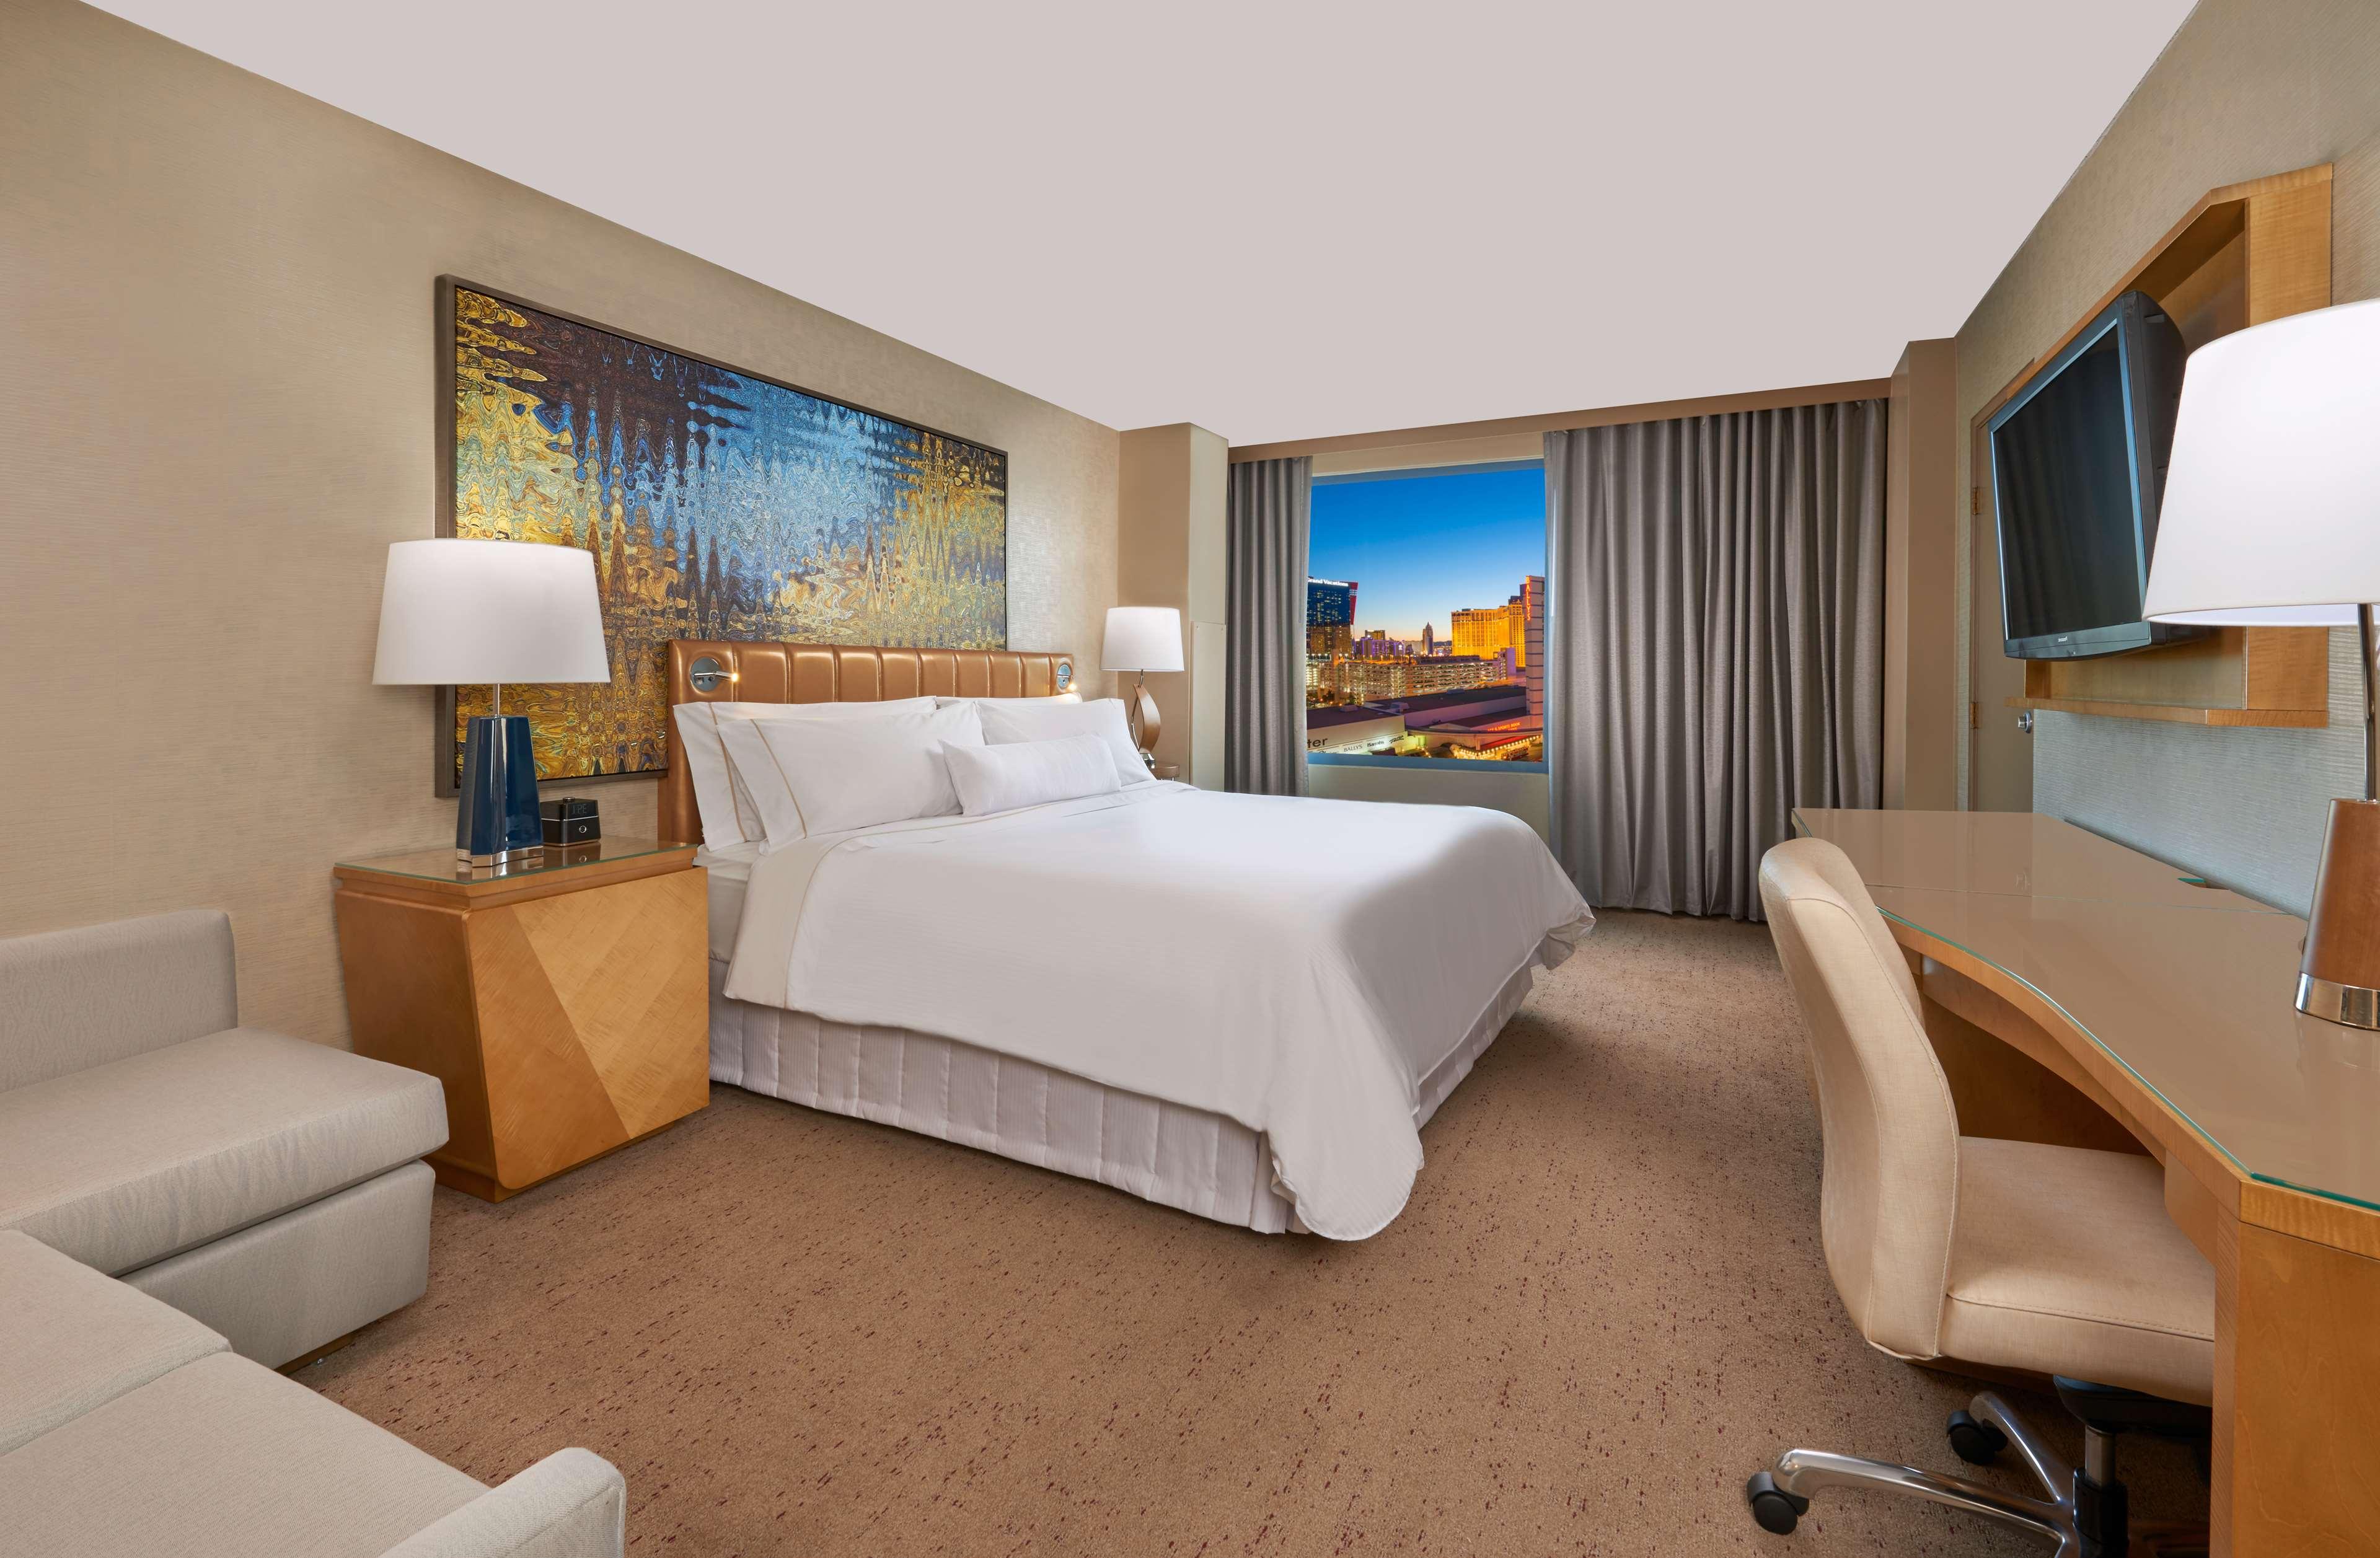 Las Vegas Marriott - UPDATED 2018 Prices & Hotel Reviews